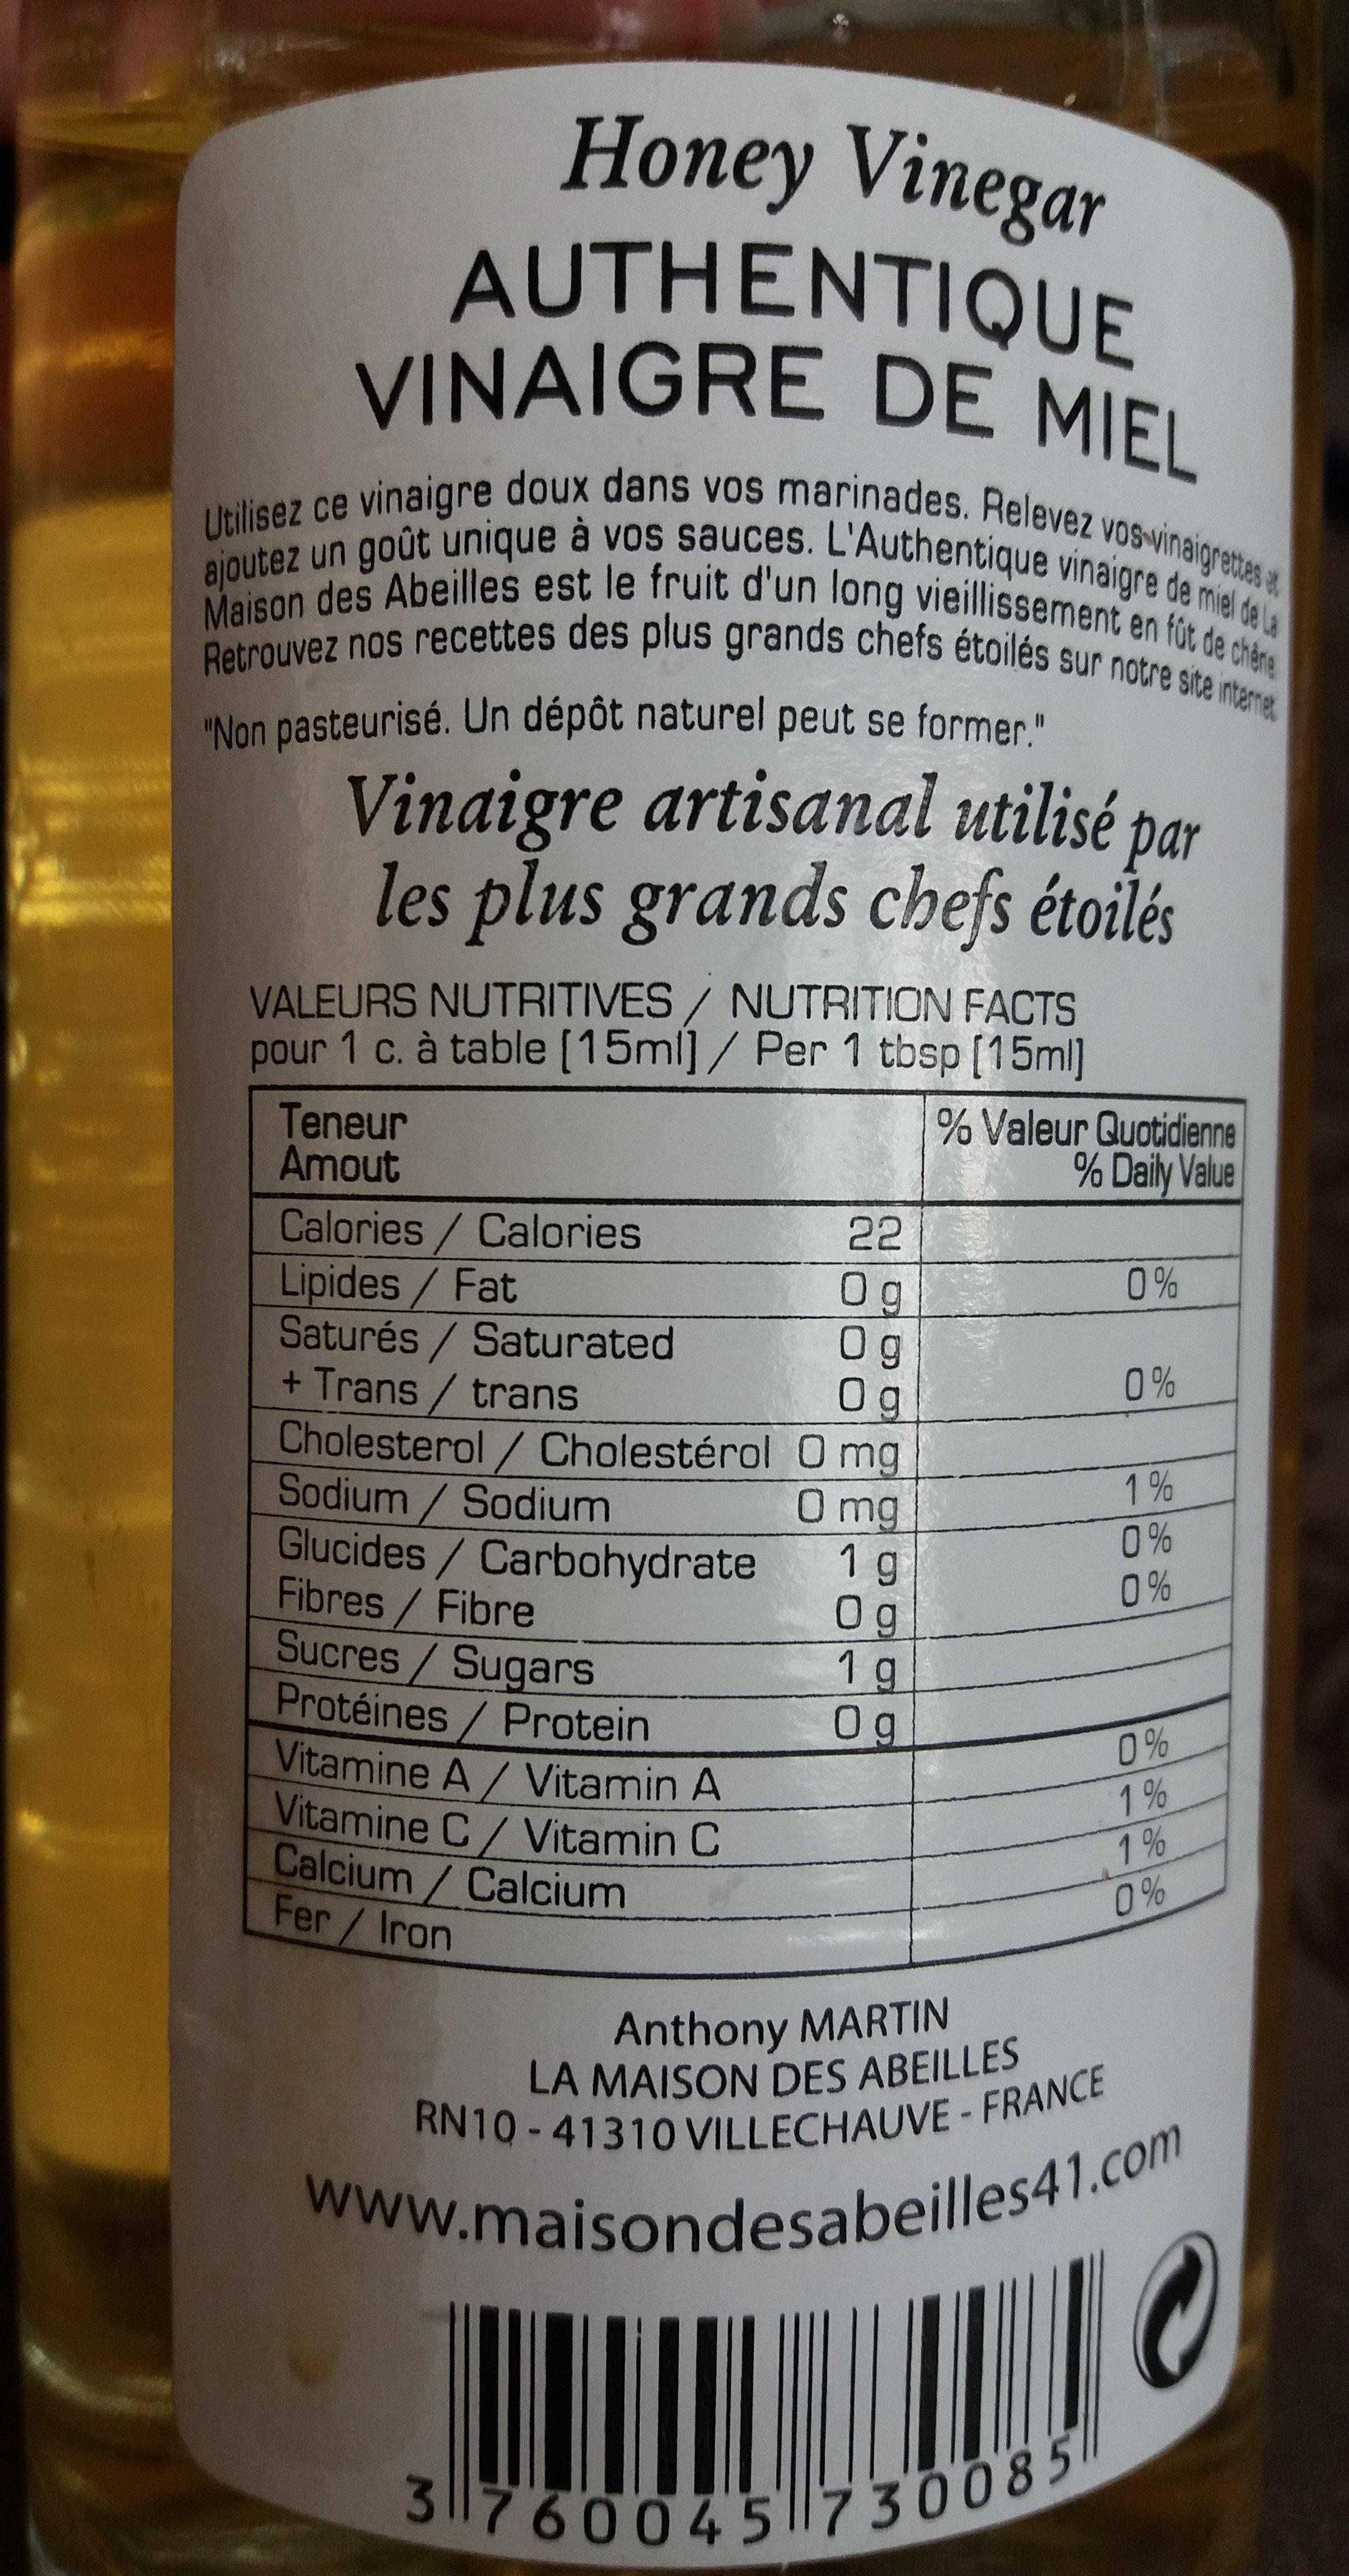 Authentique vinaigre de miel - Ingrediënten - fr